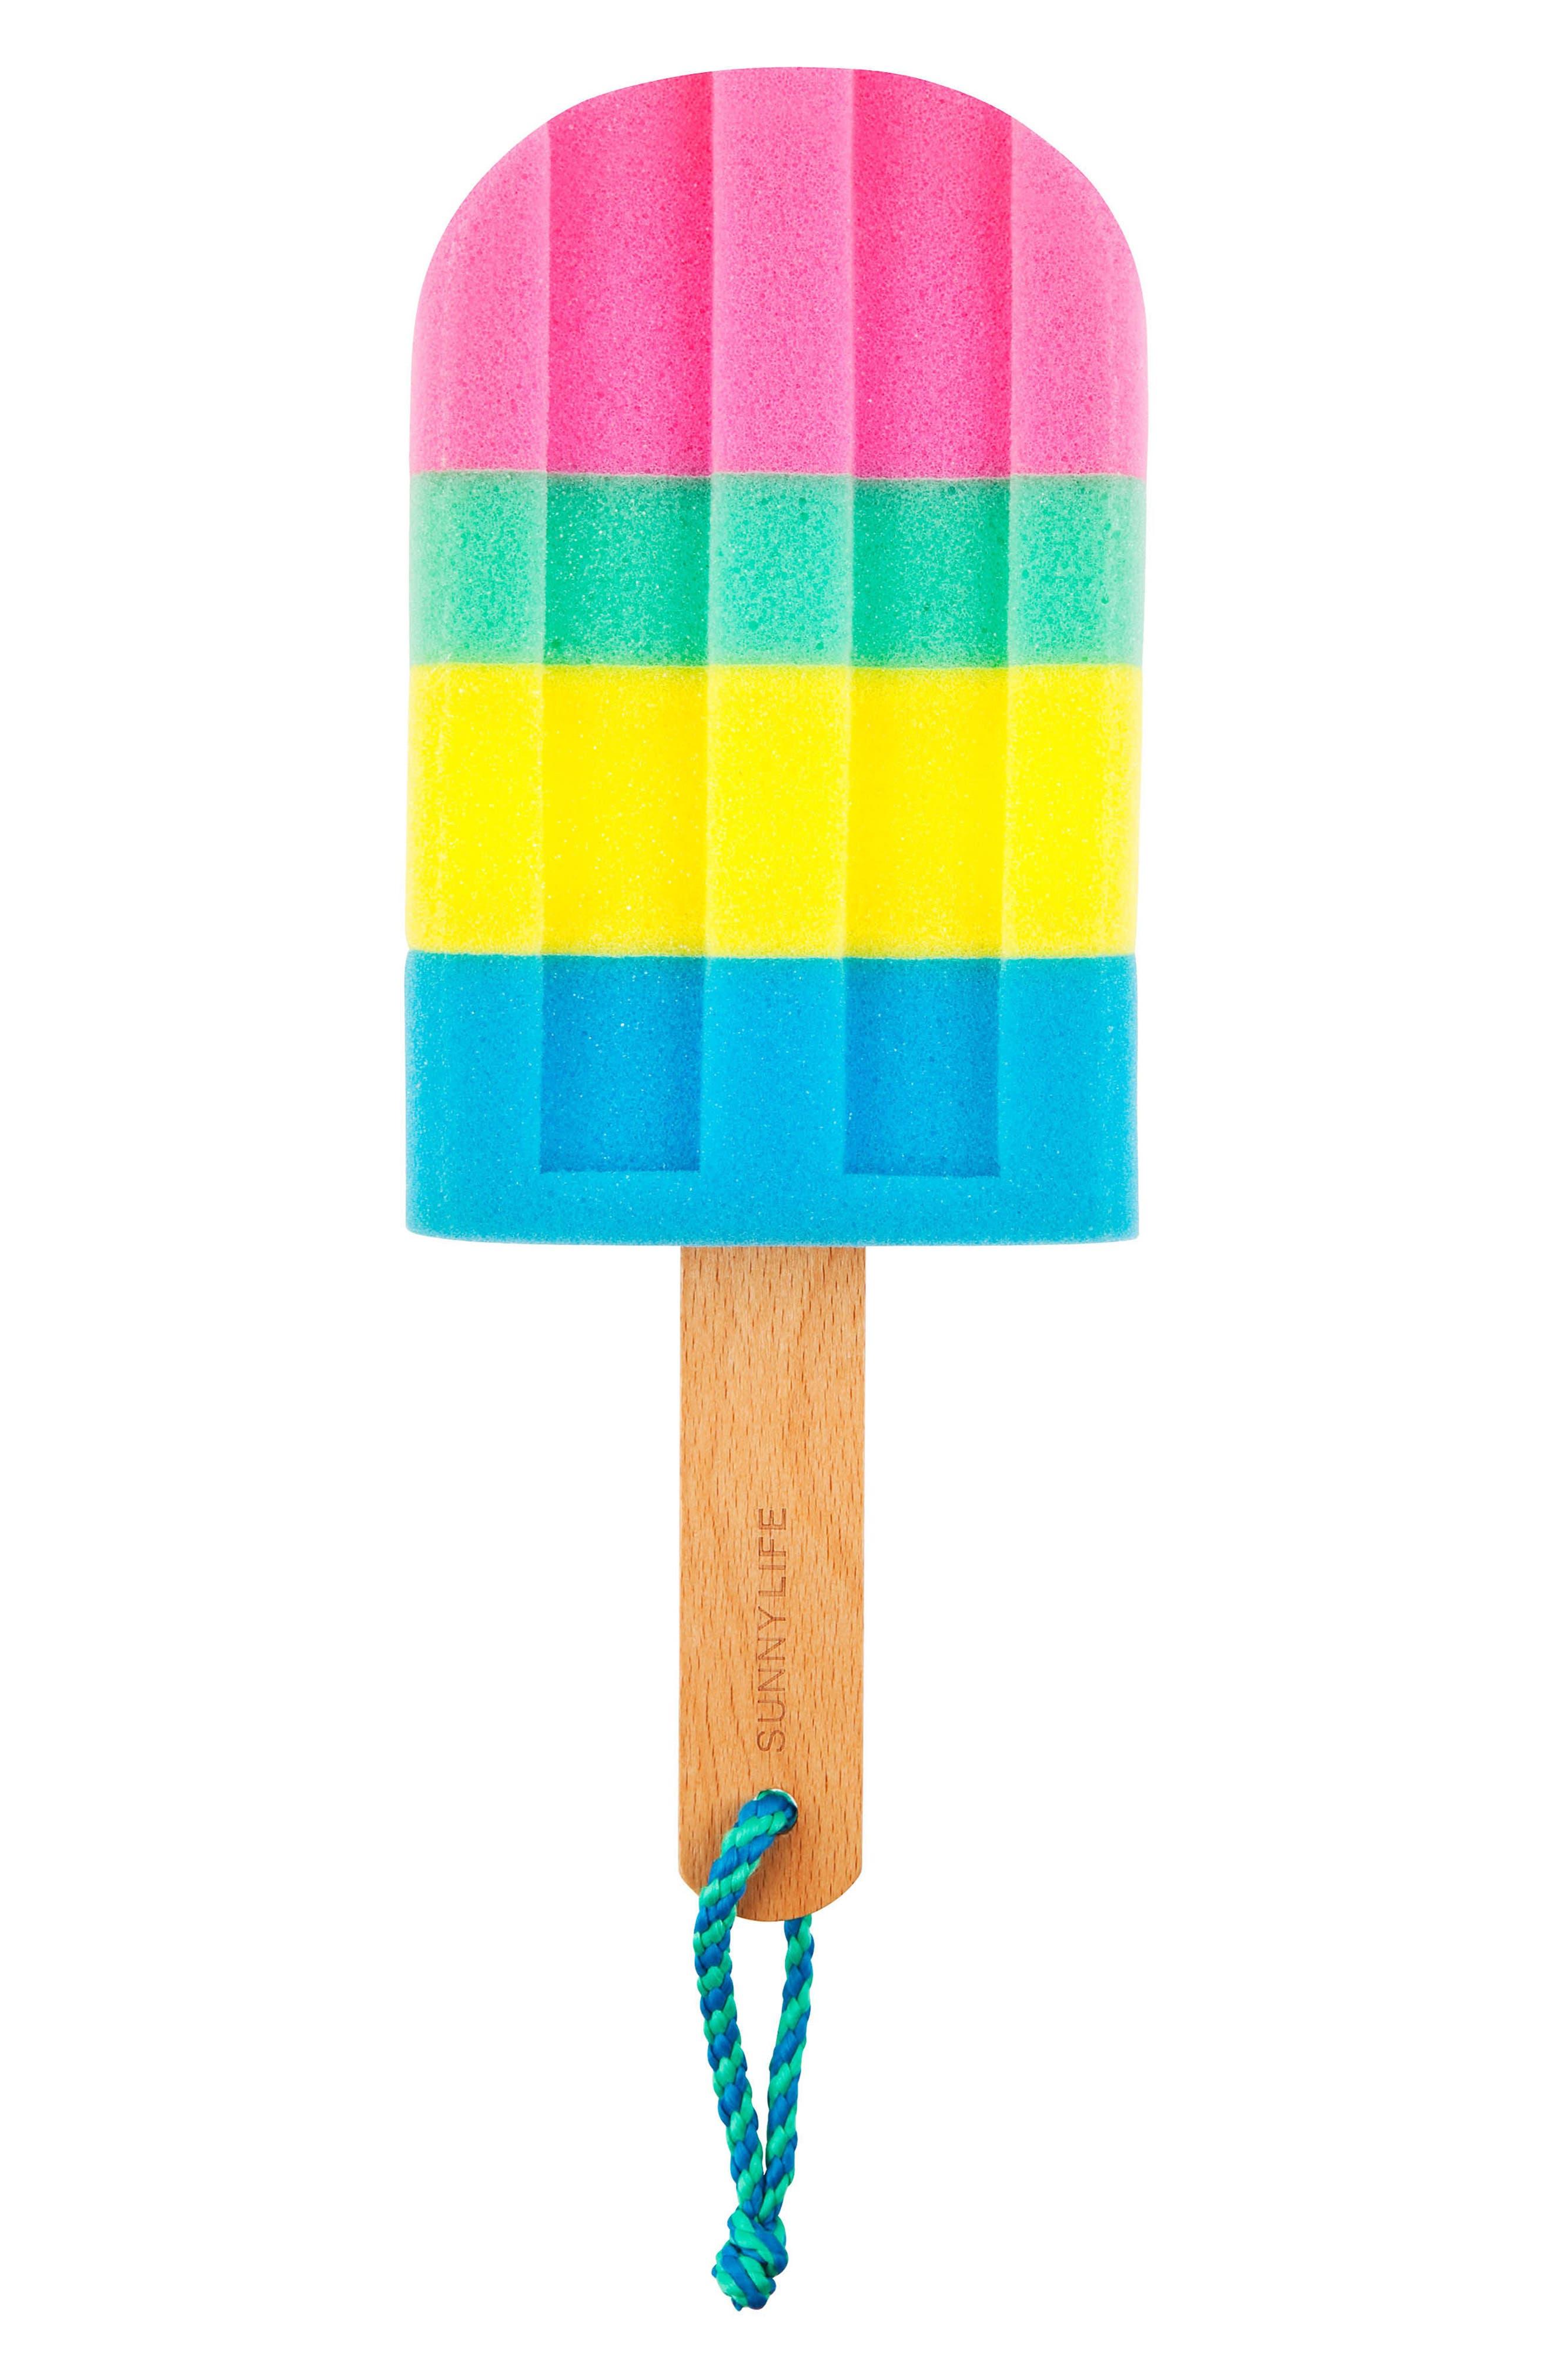 Ice Lolly Bath Sponge,                             Main thumbnail 1, color,                             400